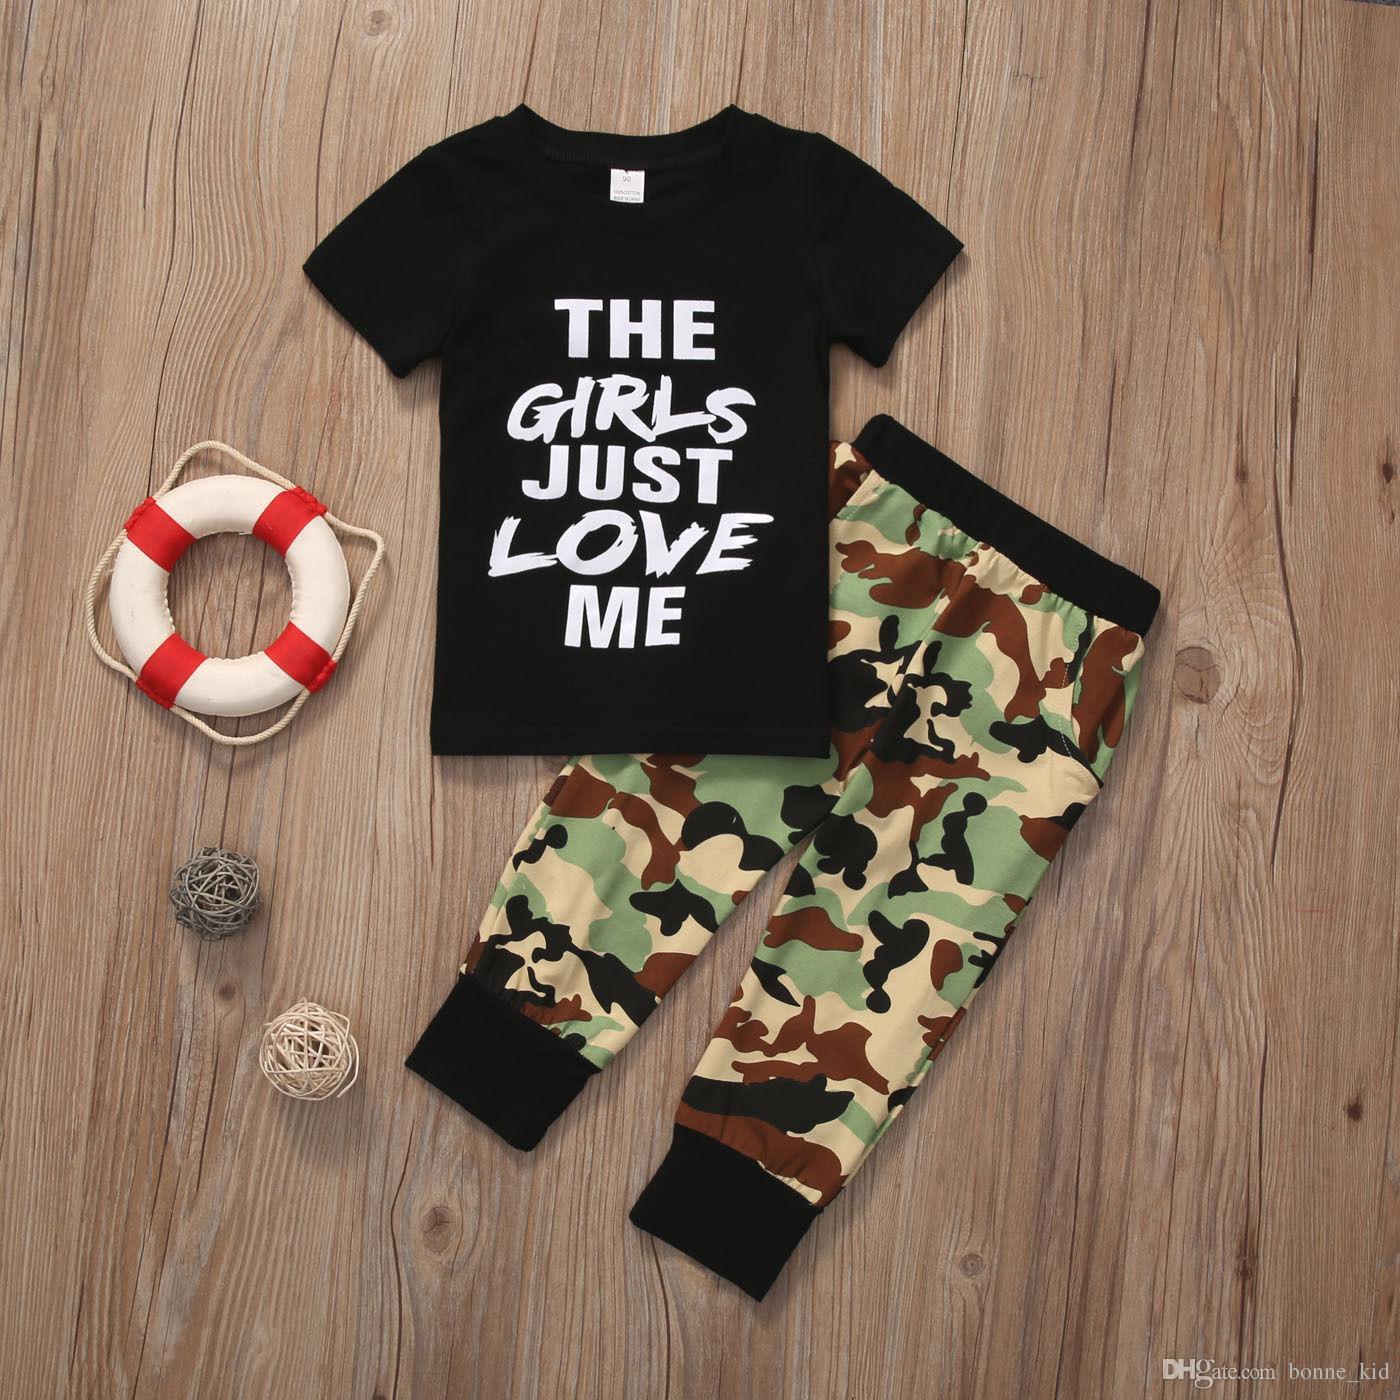 2 unids Toddler Baby Boys Ropa Algodón T-shirt + Pantalones Camo Pantalones Trajes Cool Boy Set Wholesale Kid Niños Ropa Negro Tee Trajes